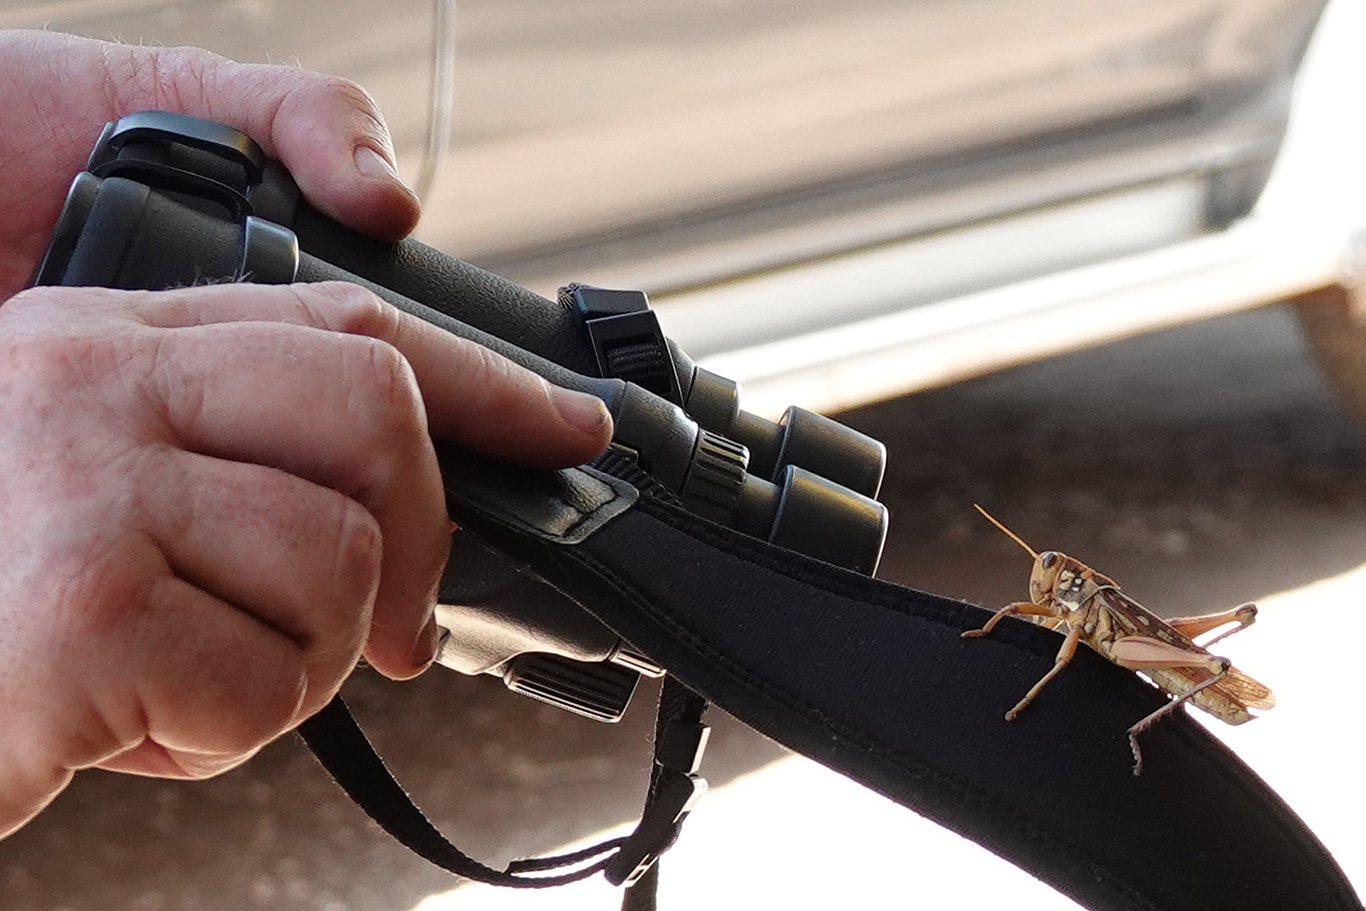 Grasshopper on Binoculars, Unknown location, Senegal.